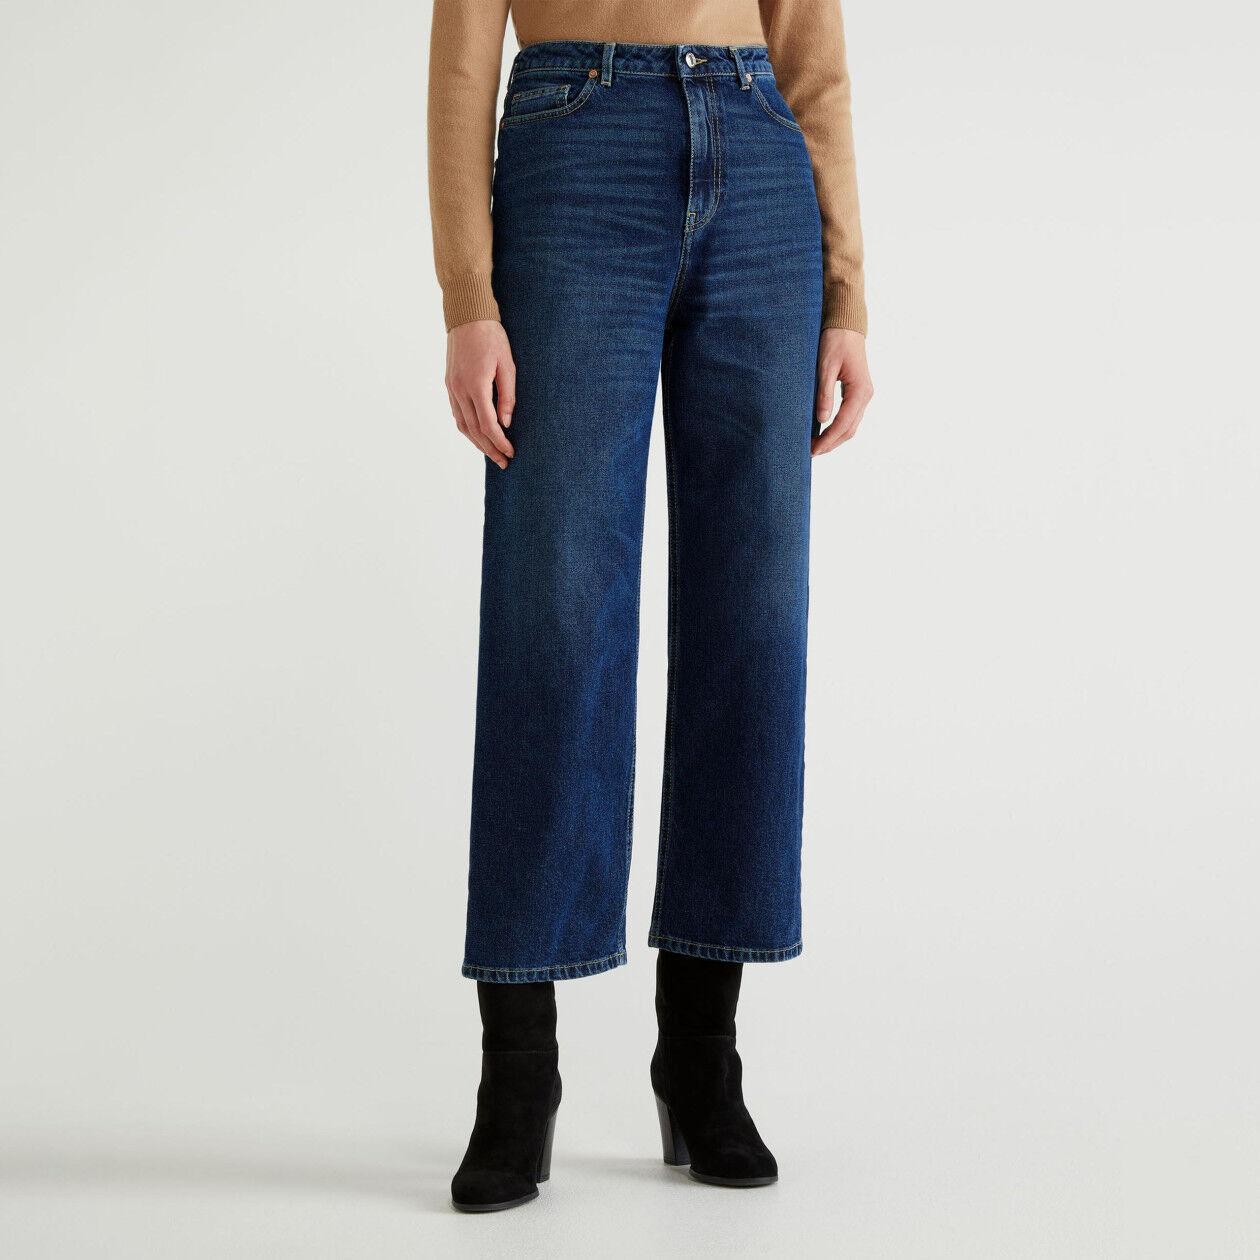 Jeans mum fit em denim stretch